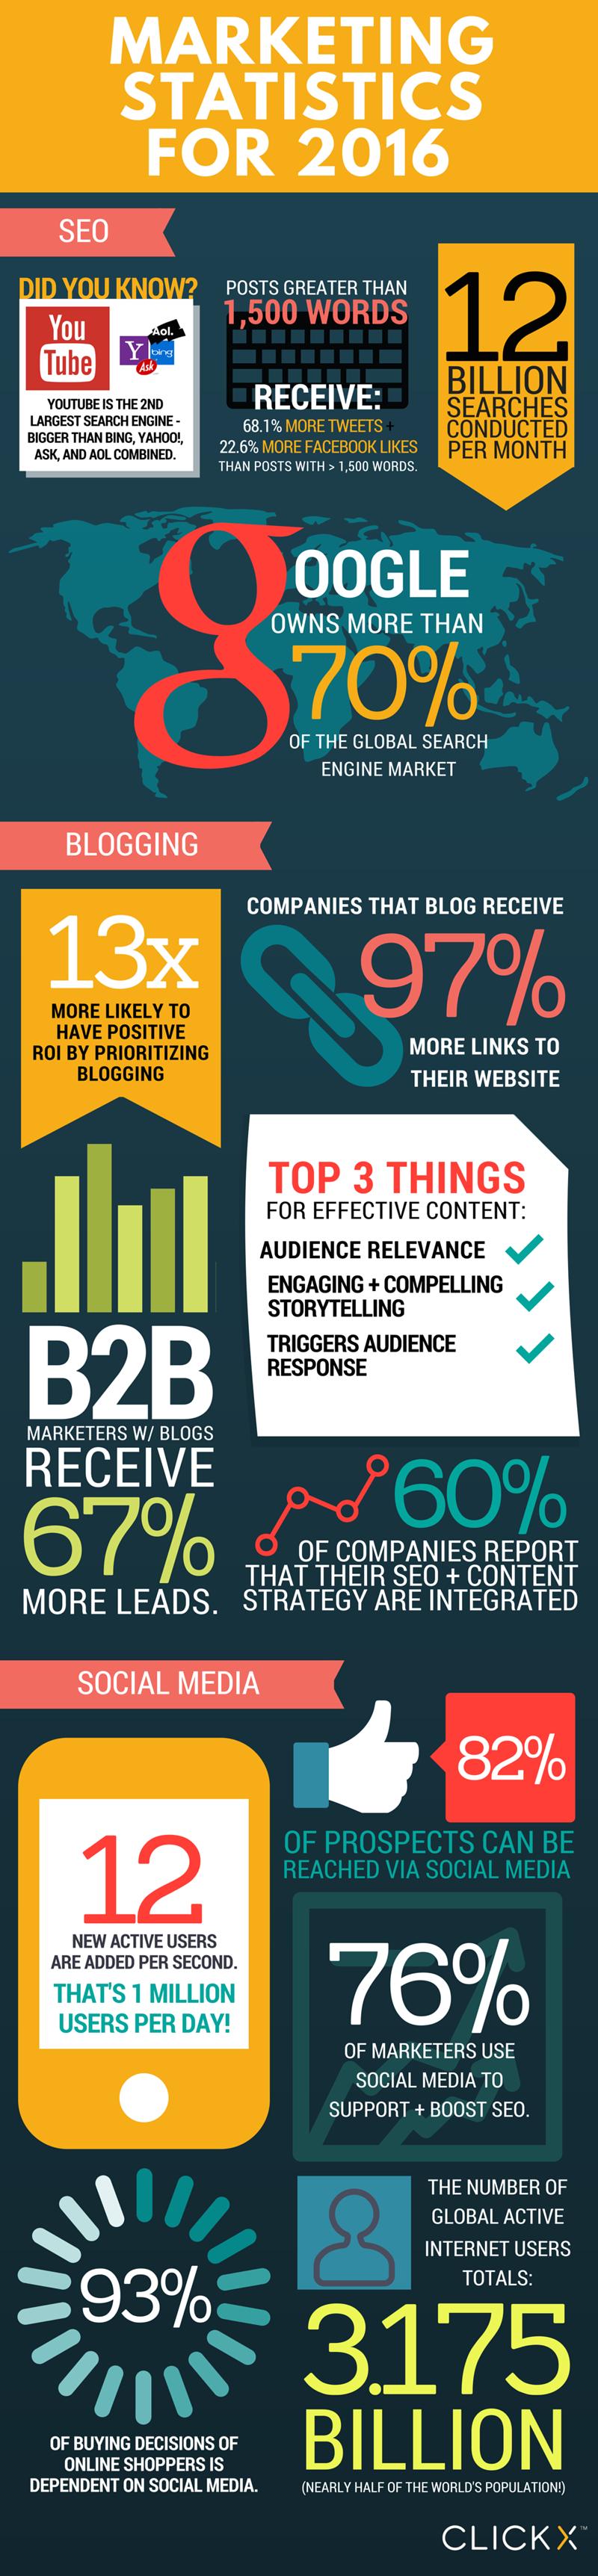 marketing statistics 2016